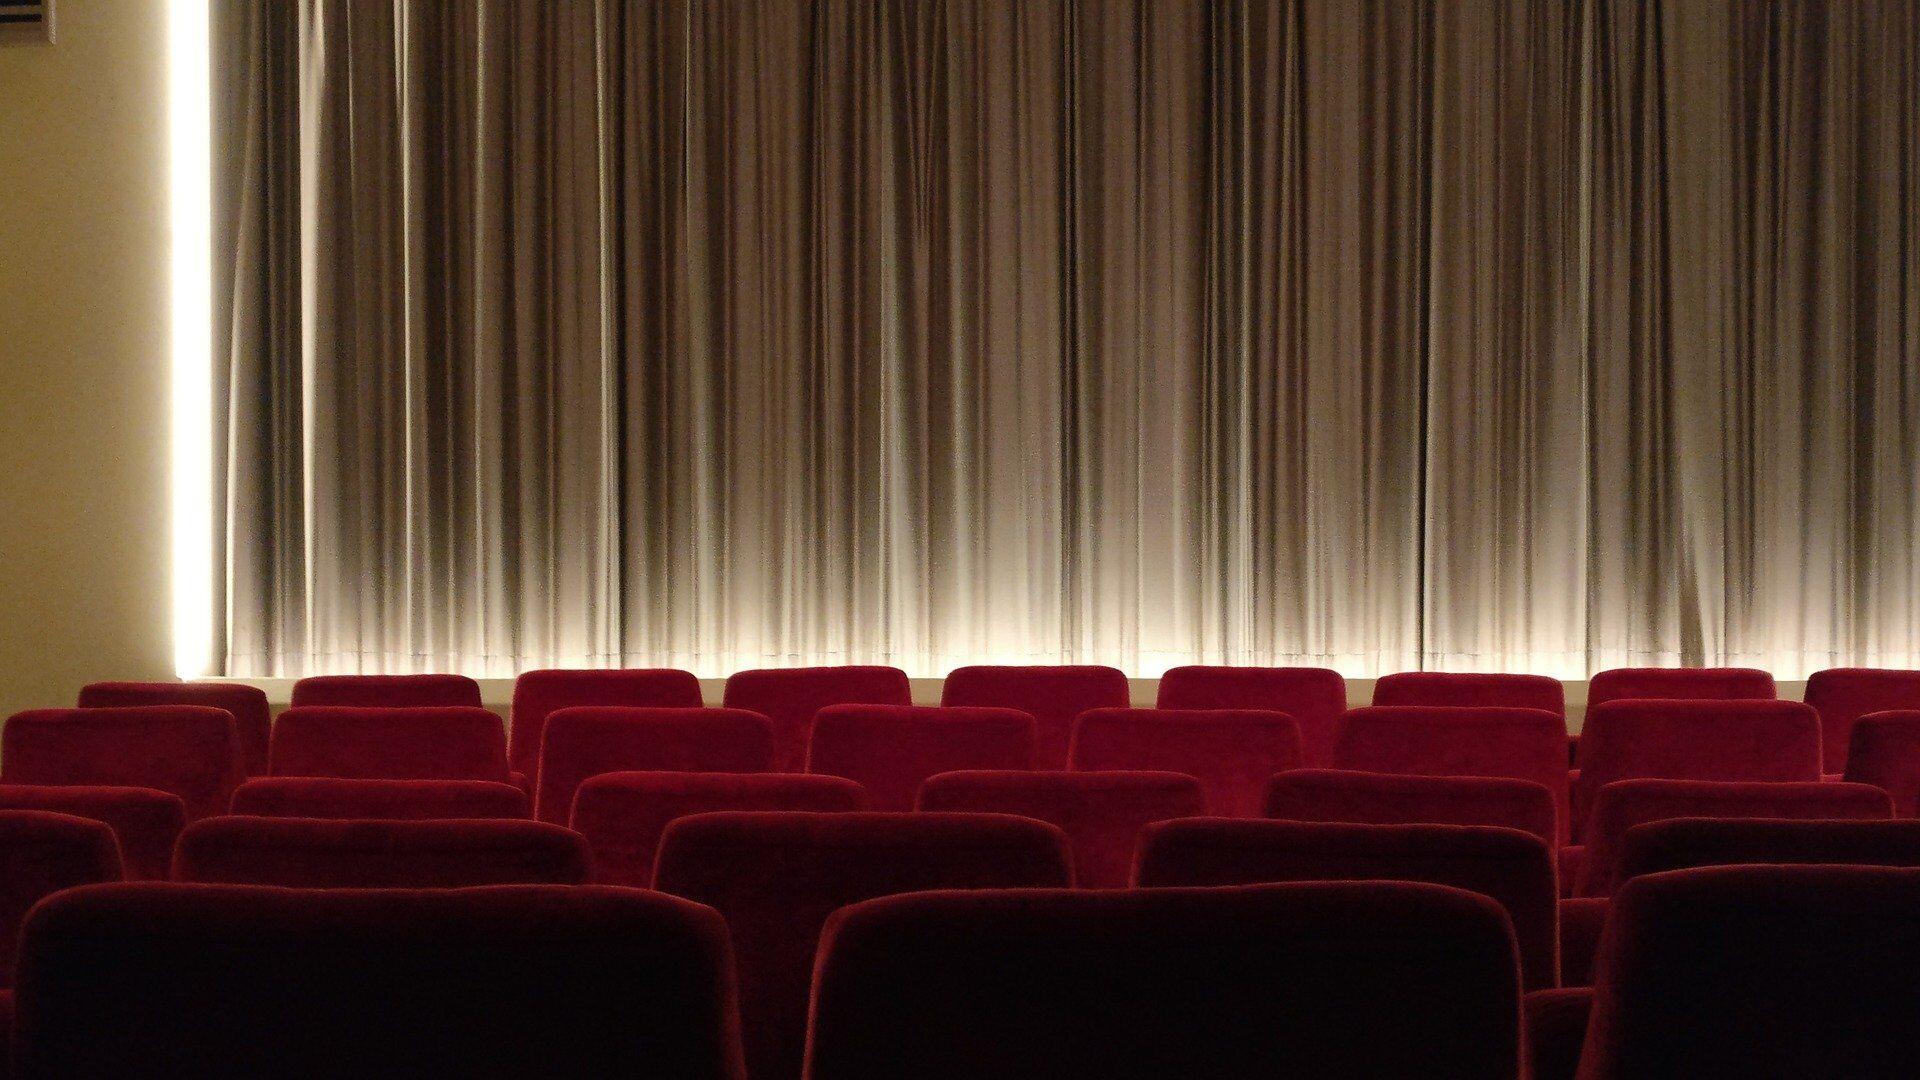 Una sala de teatro - Sputnik Mundo, 1920, 02.06.2021